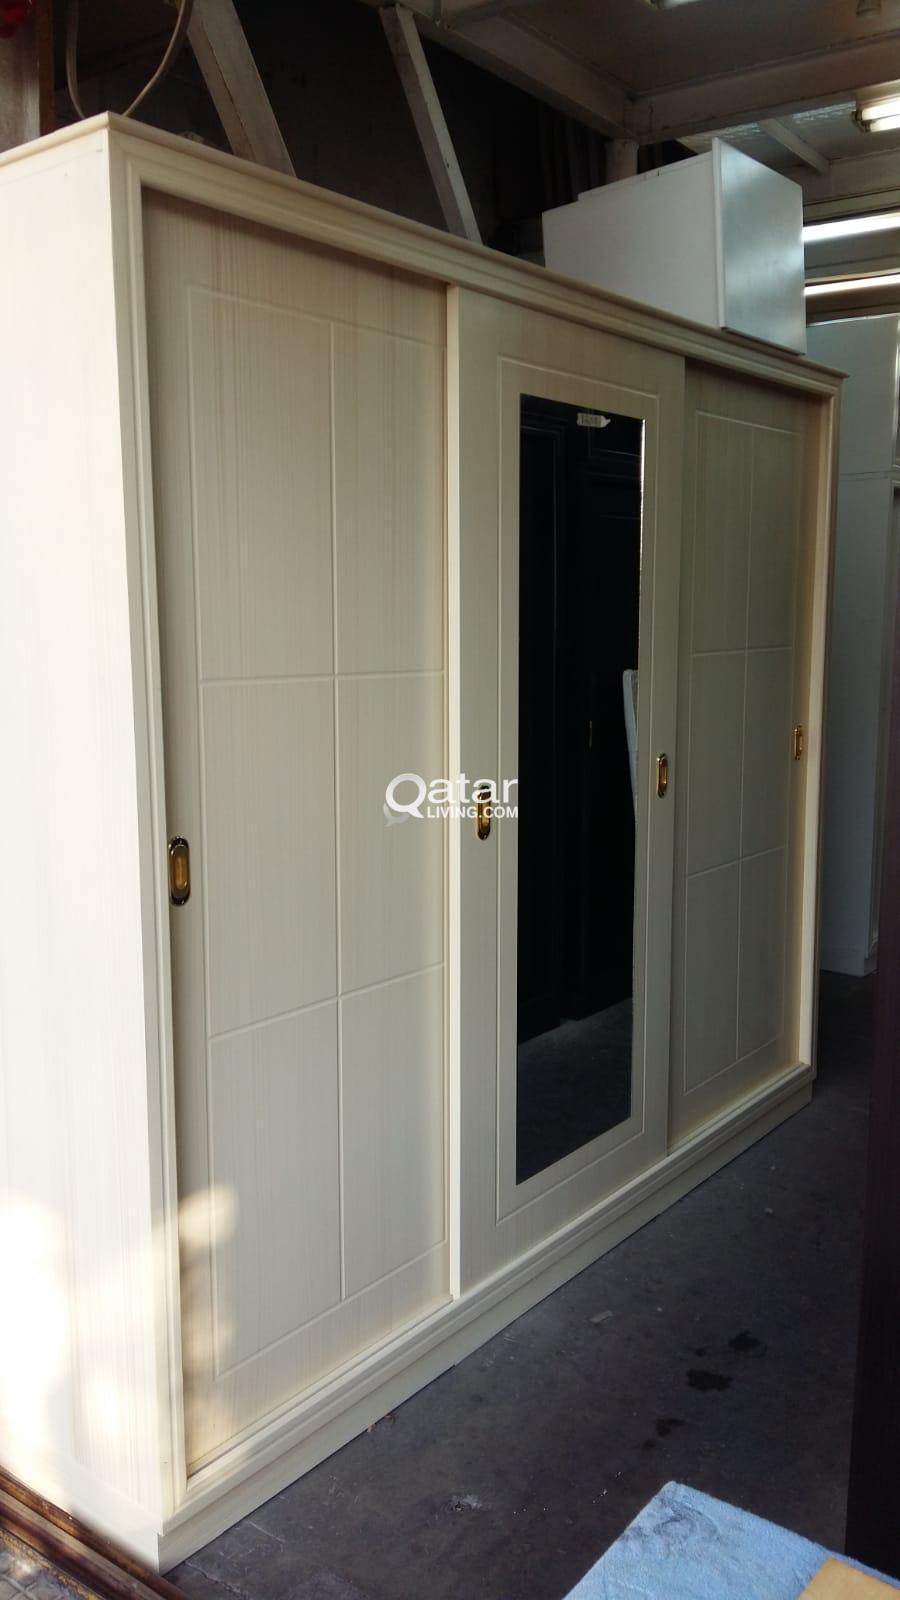 cabenet sefting service with carpenter